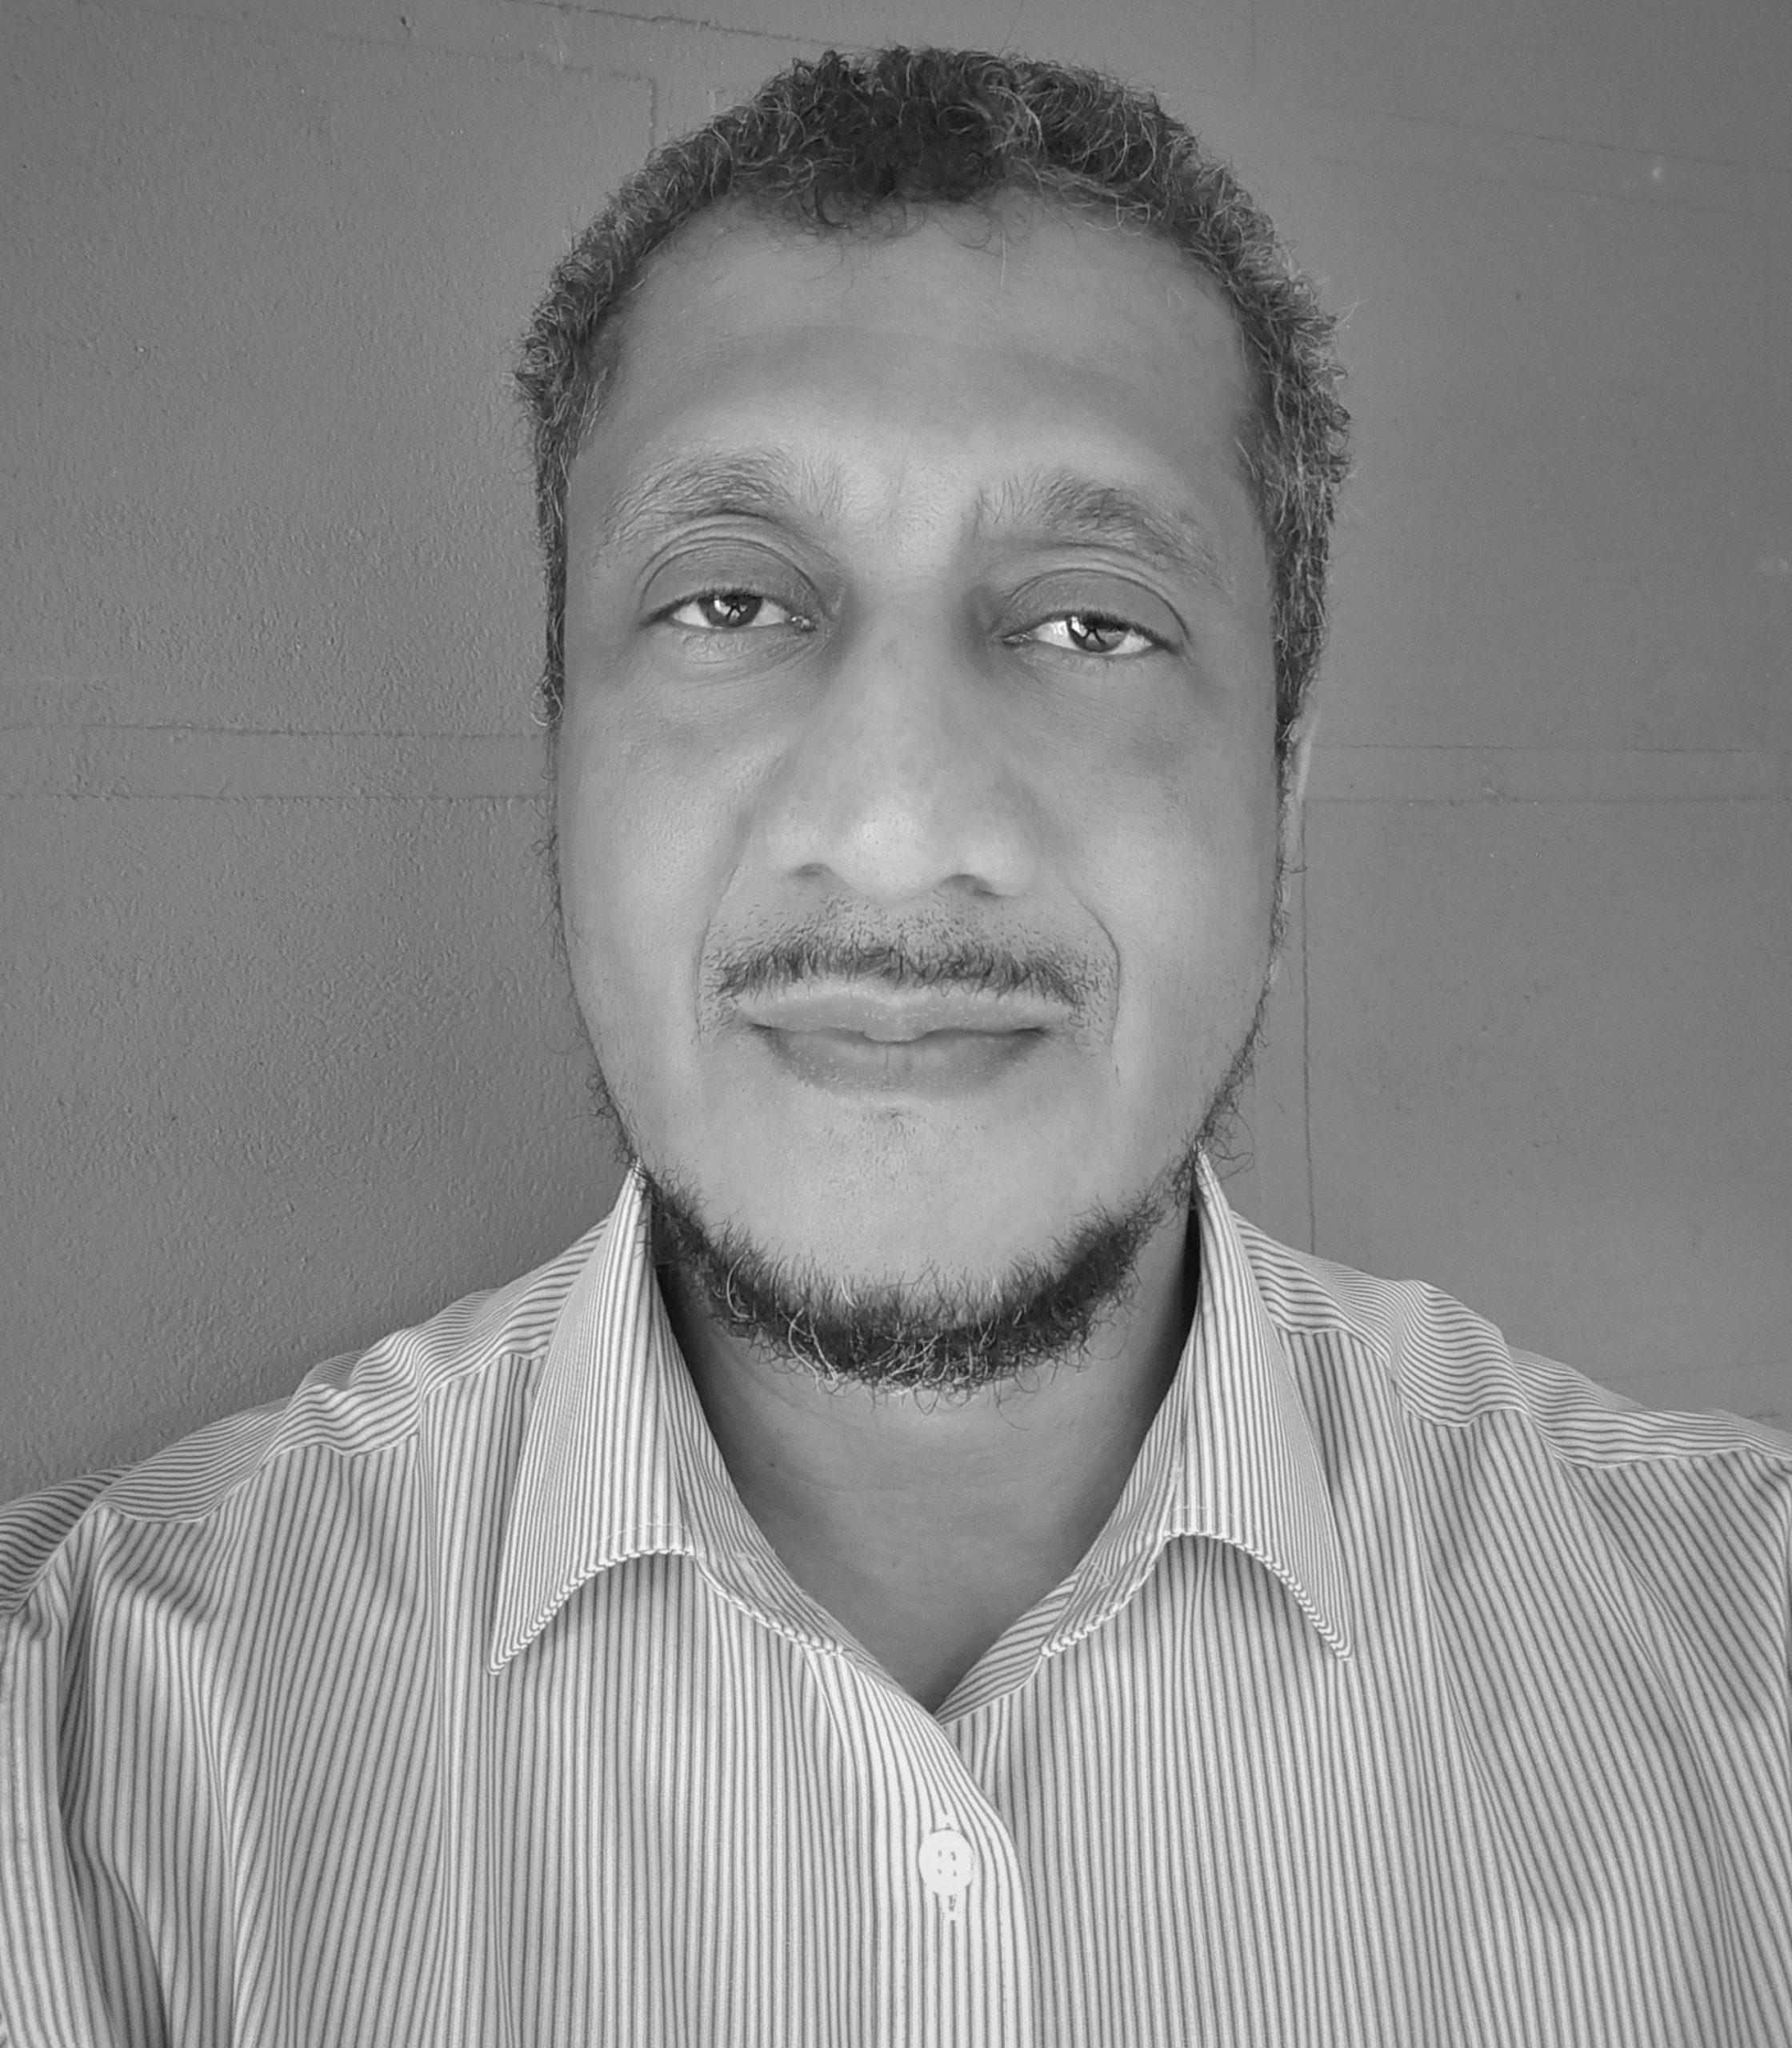 Twalib Ebrahim